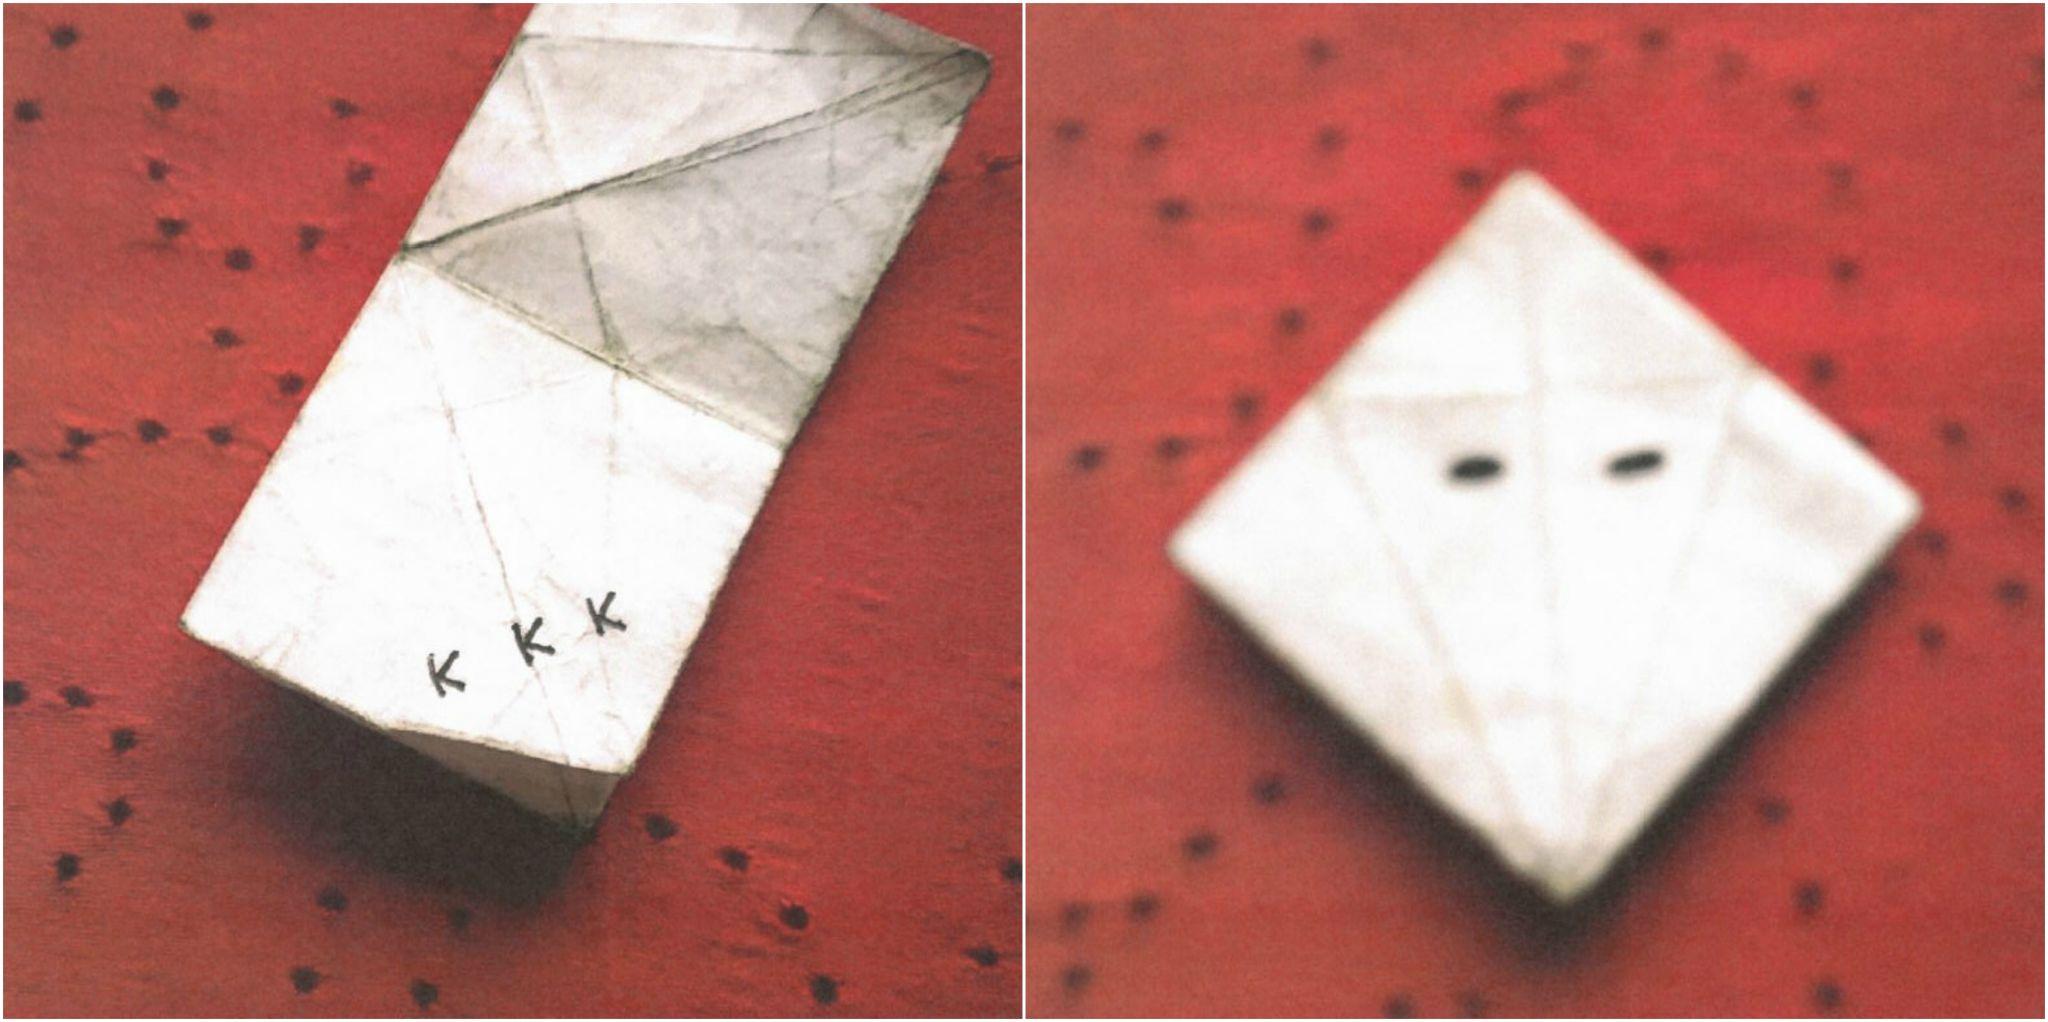 Kkk origami case recalls use of religious symbols to promote hate kkk origami case recalls use of religious symbols to promote hate houston chronicle biocorpaavc Images